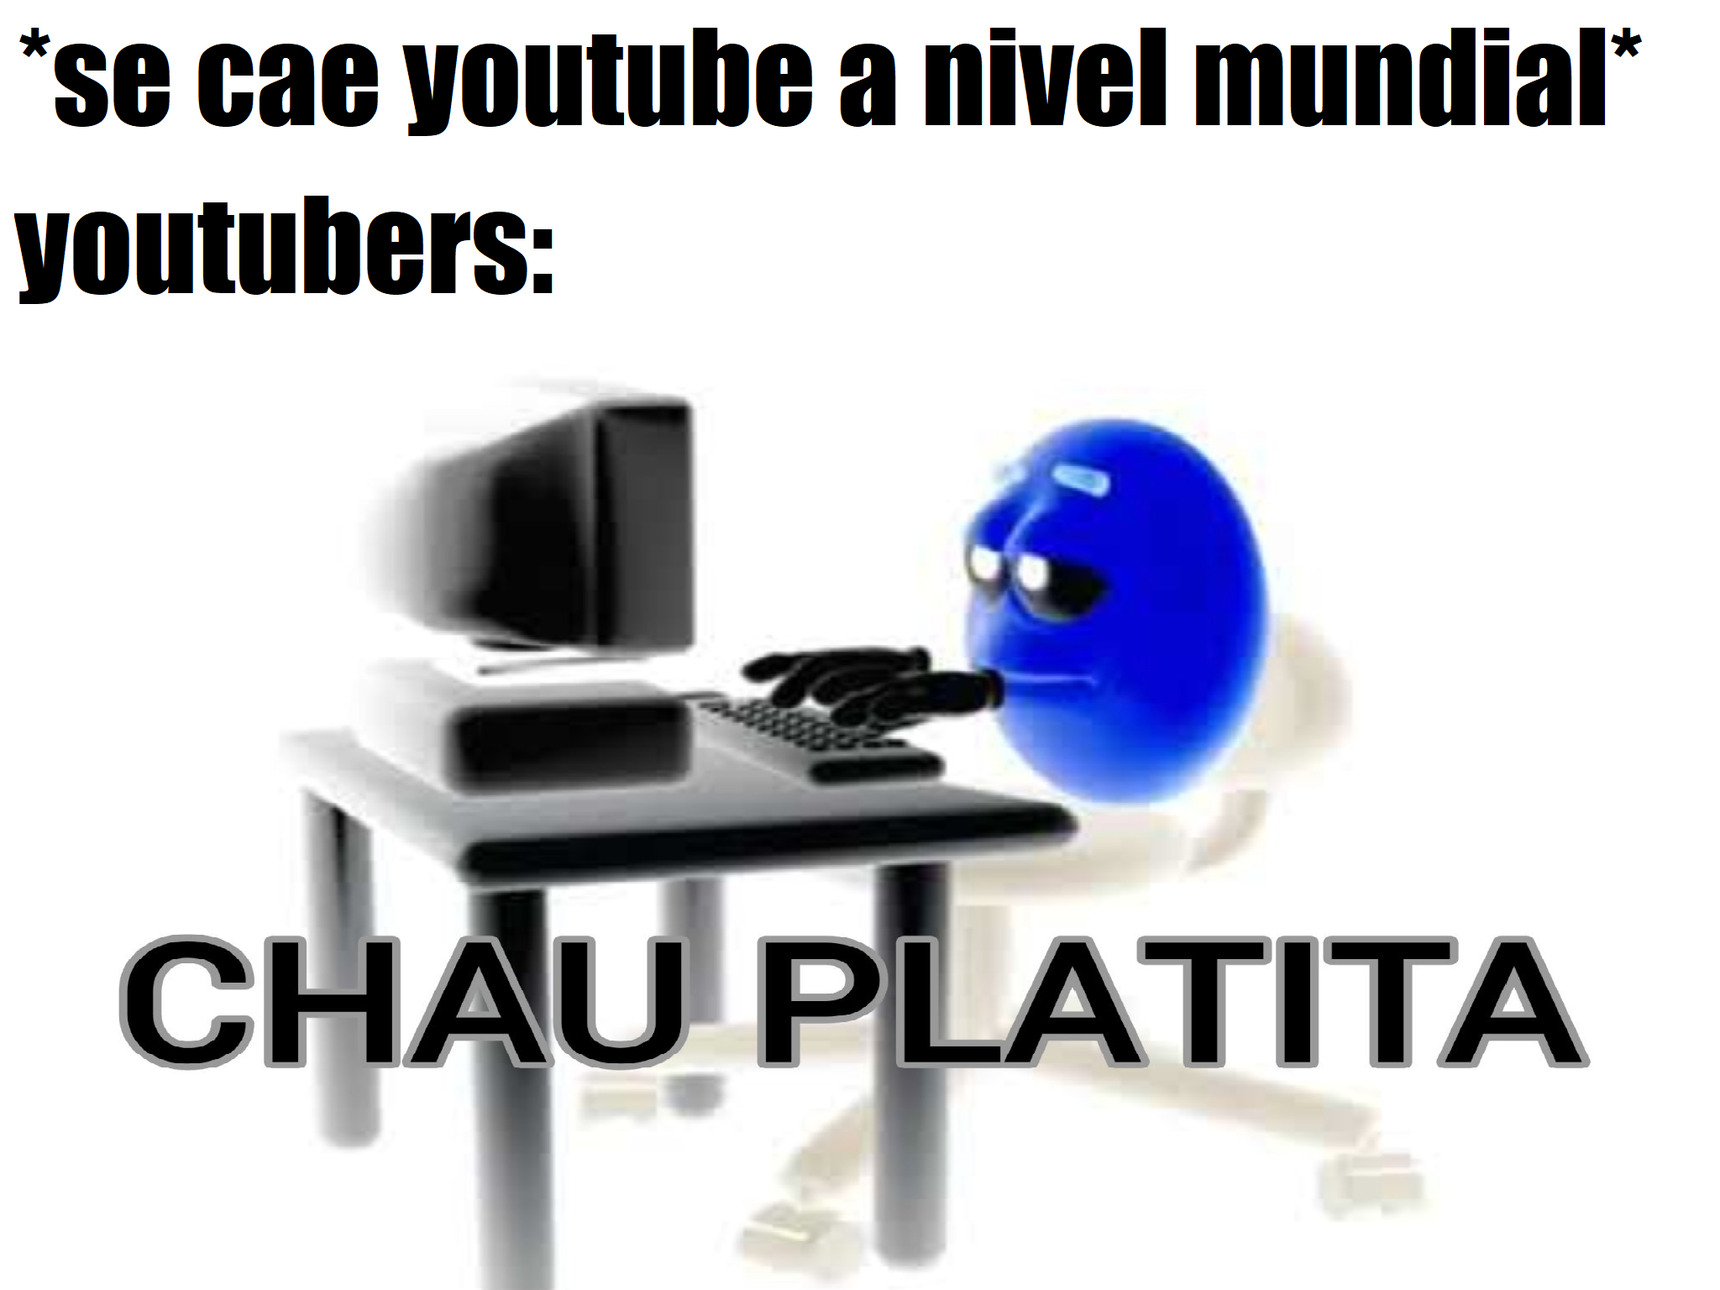 ayer se cayó youtube - meme